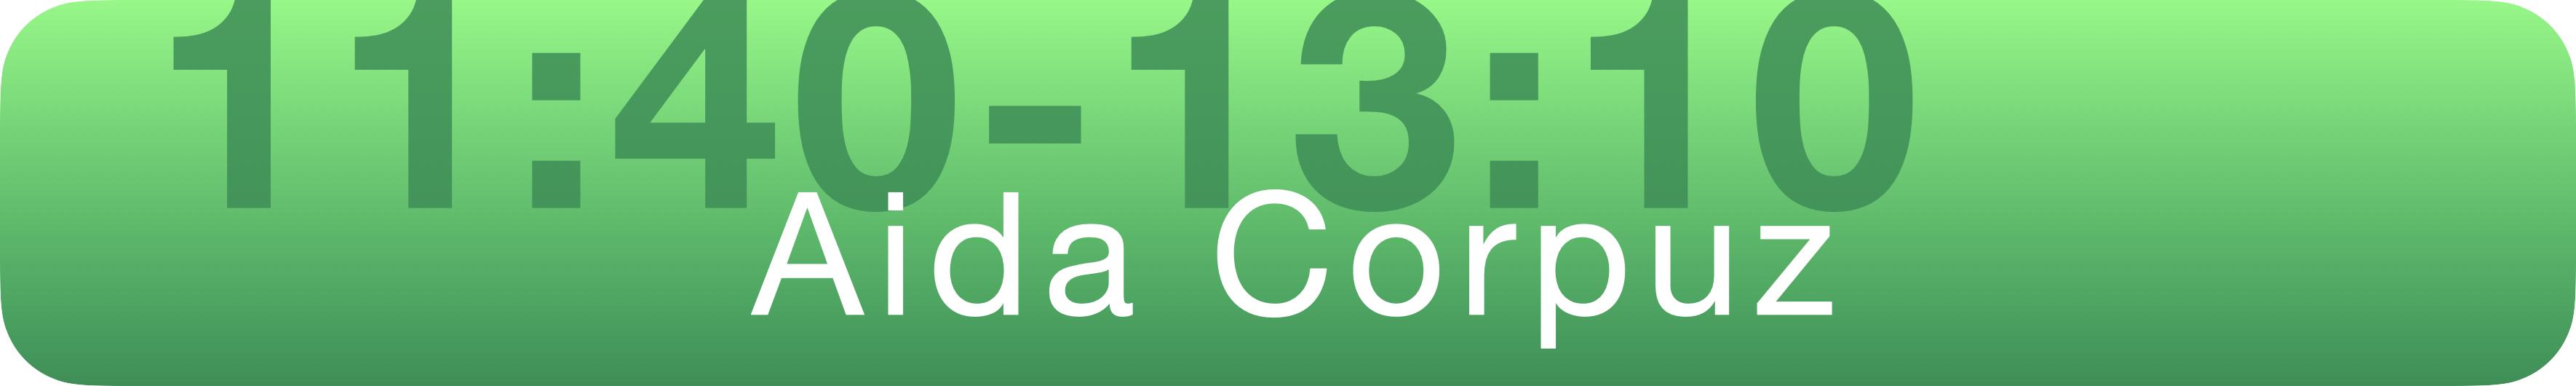 Aida Corpuz Advising Button 1140